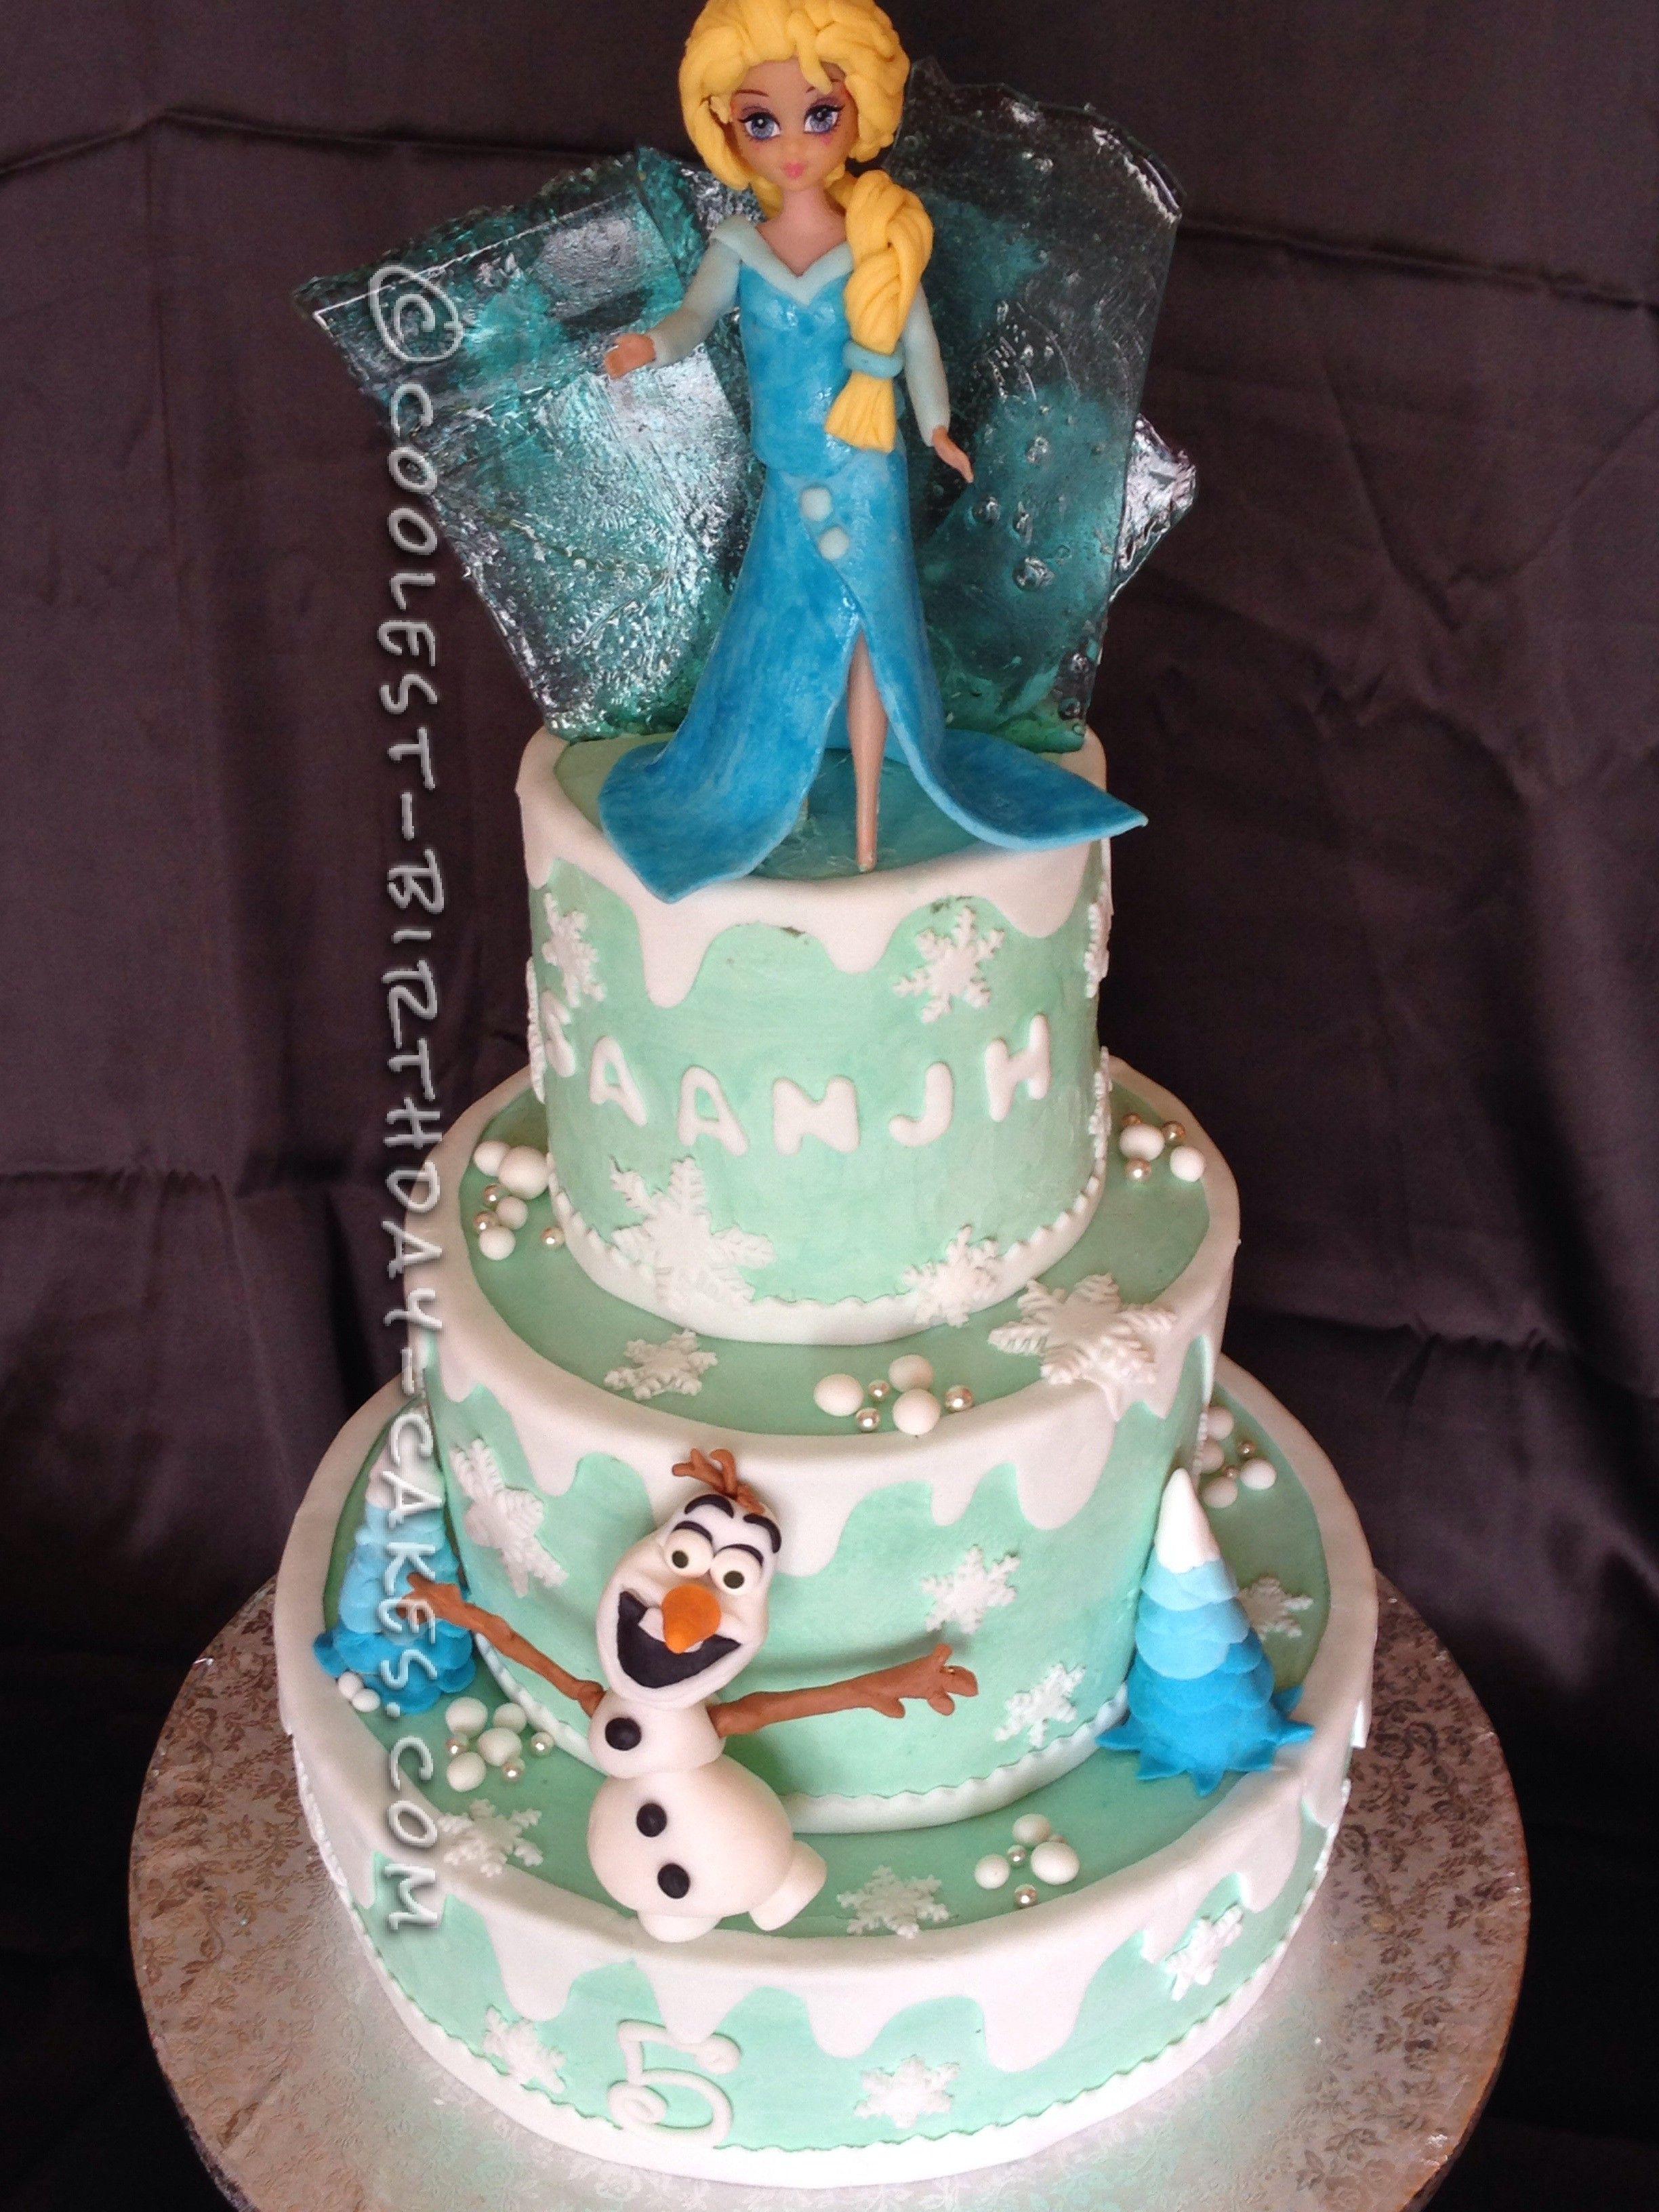 Coolest Frozen Theme Cake for a Little Girl Homemade birthday